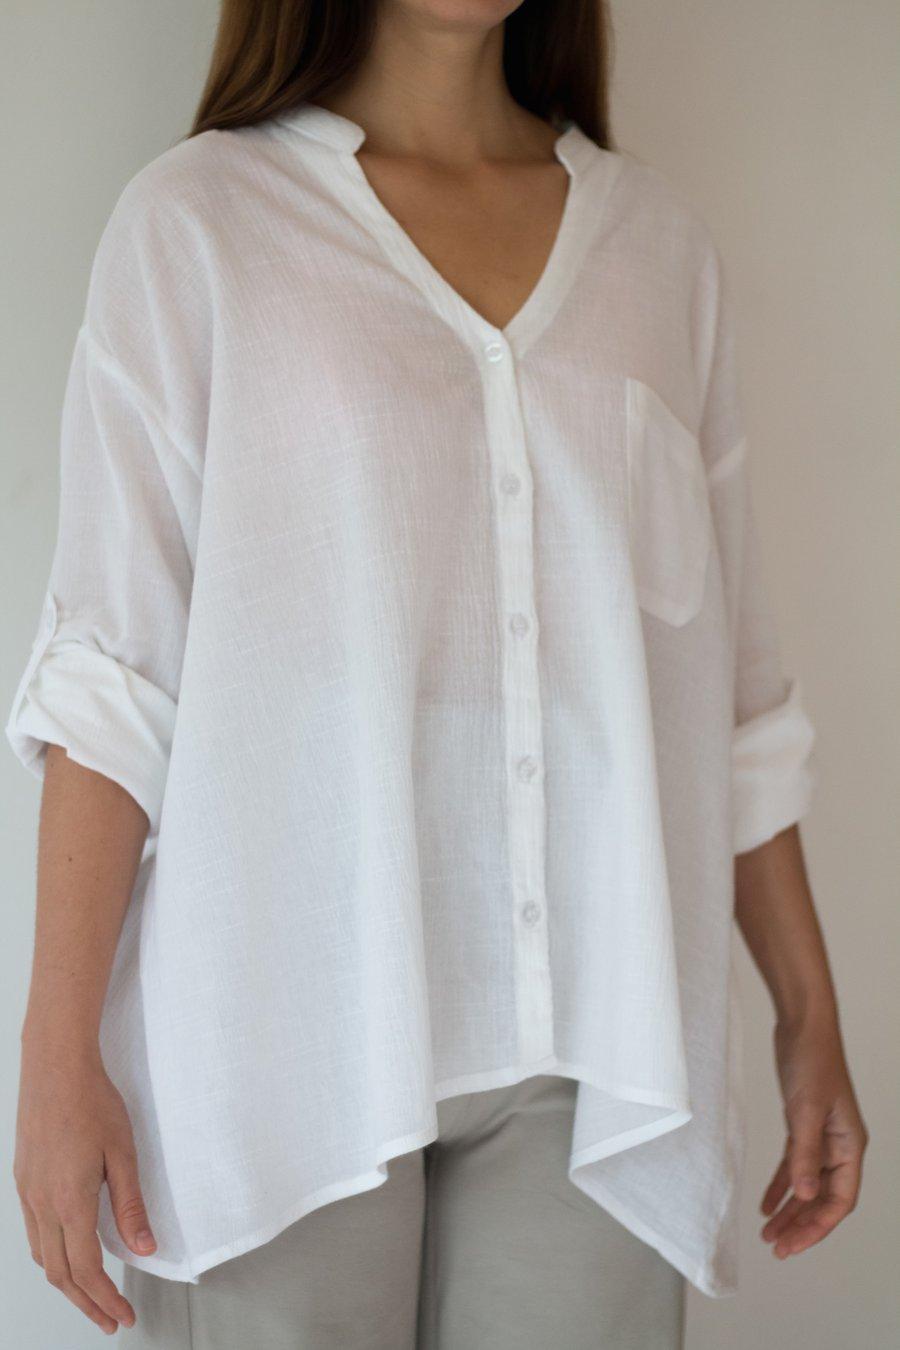 Image of Light Shirt